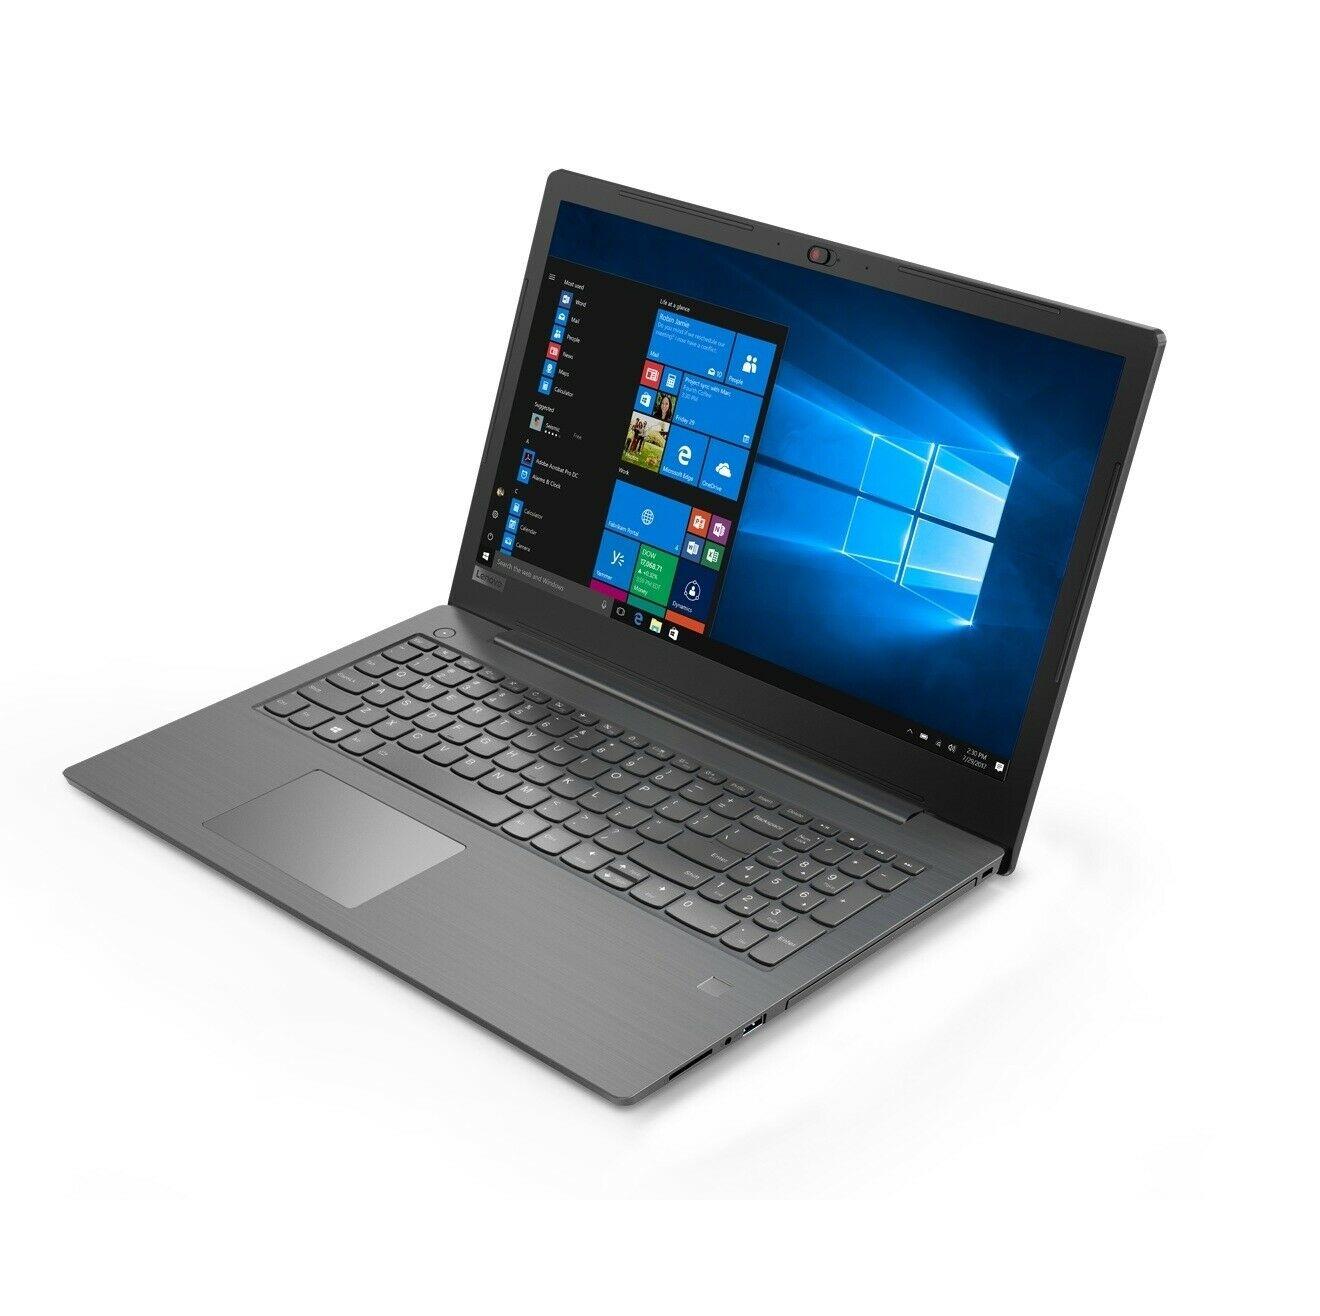 "Lenovo V330-15IKB (Core i7-8550U, 8GB Ram, 256GB SSD, Radeon 530 2GB Dedicated GFX, 15.6"", Win10) Laptop - £474.99 @ Laptop Outlet / Ebay"